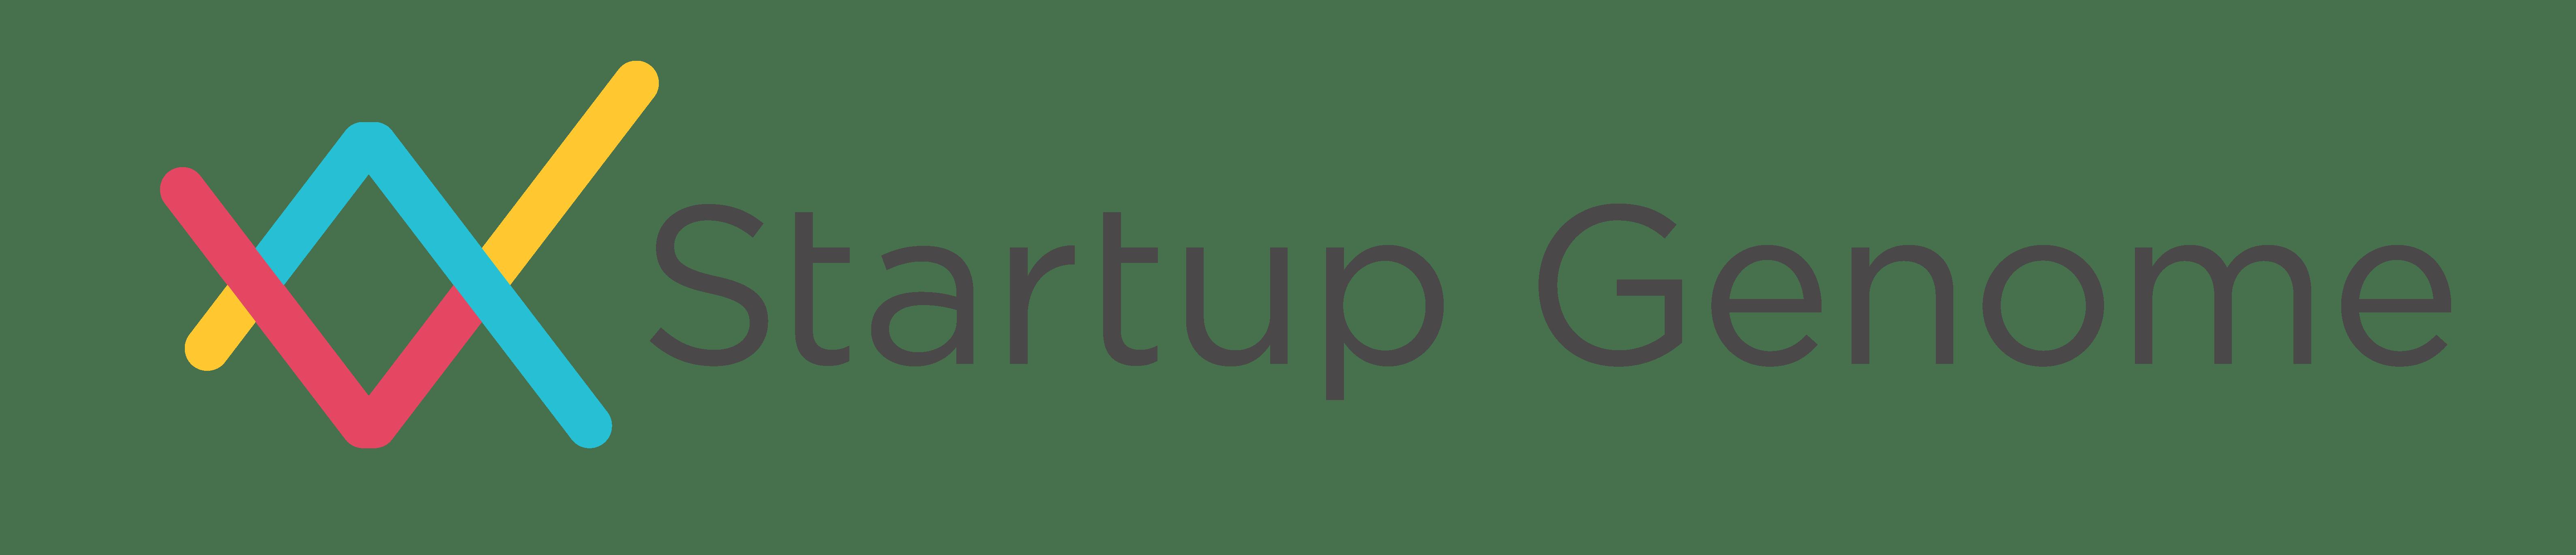 Startup Genome LLC